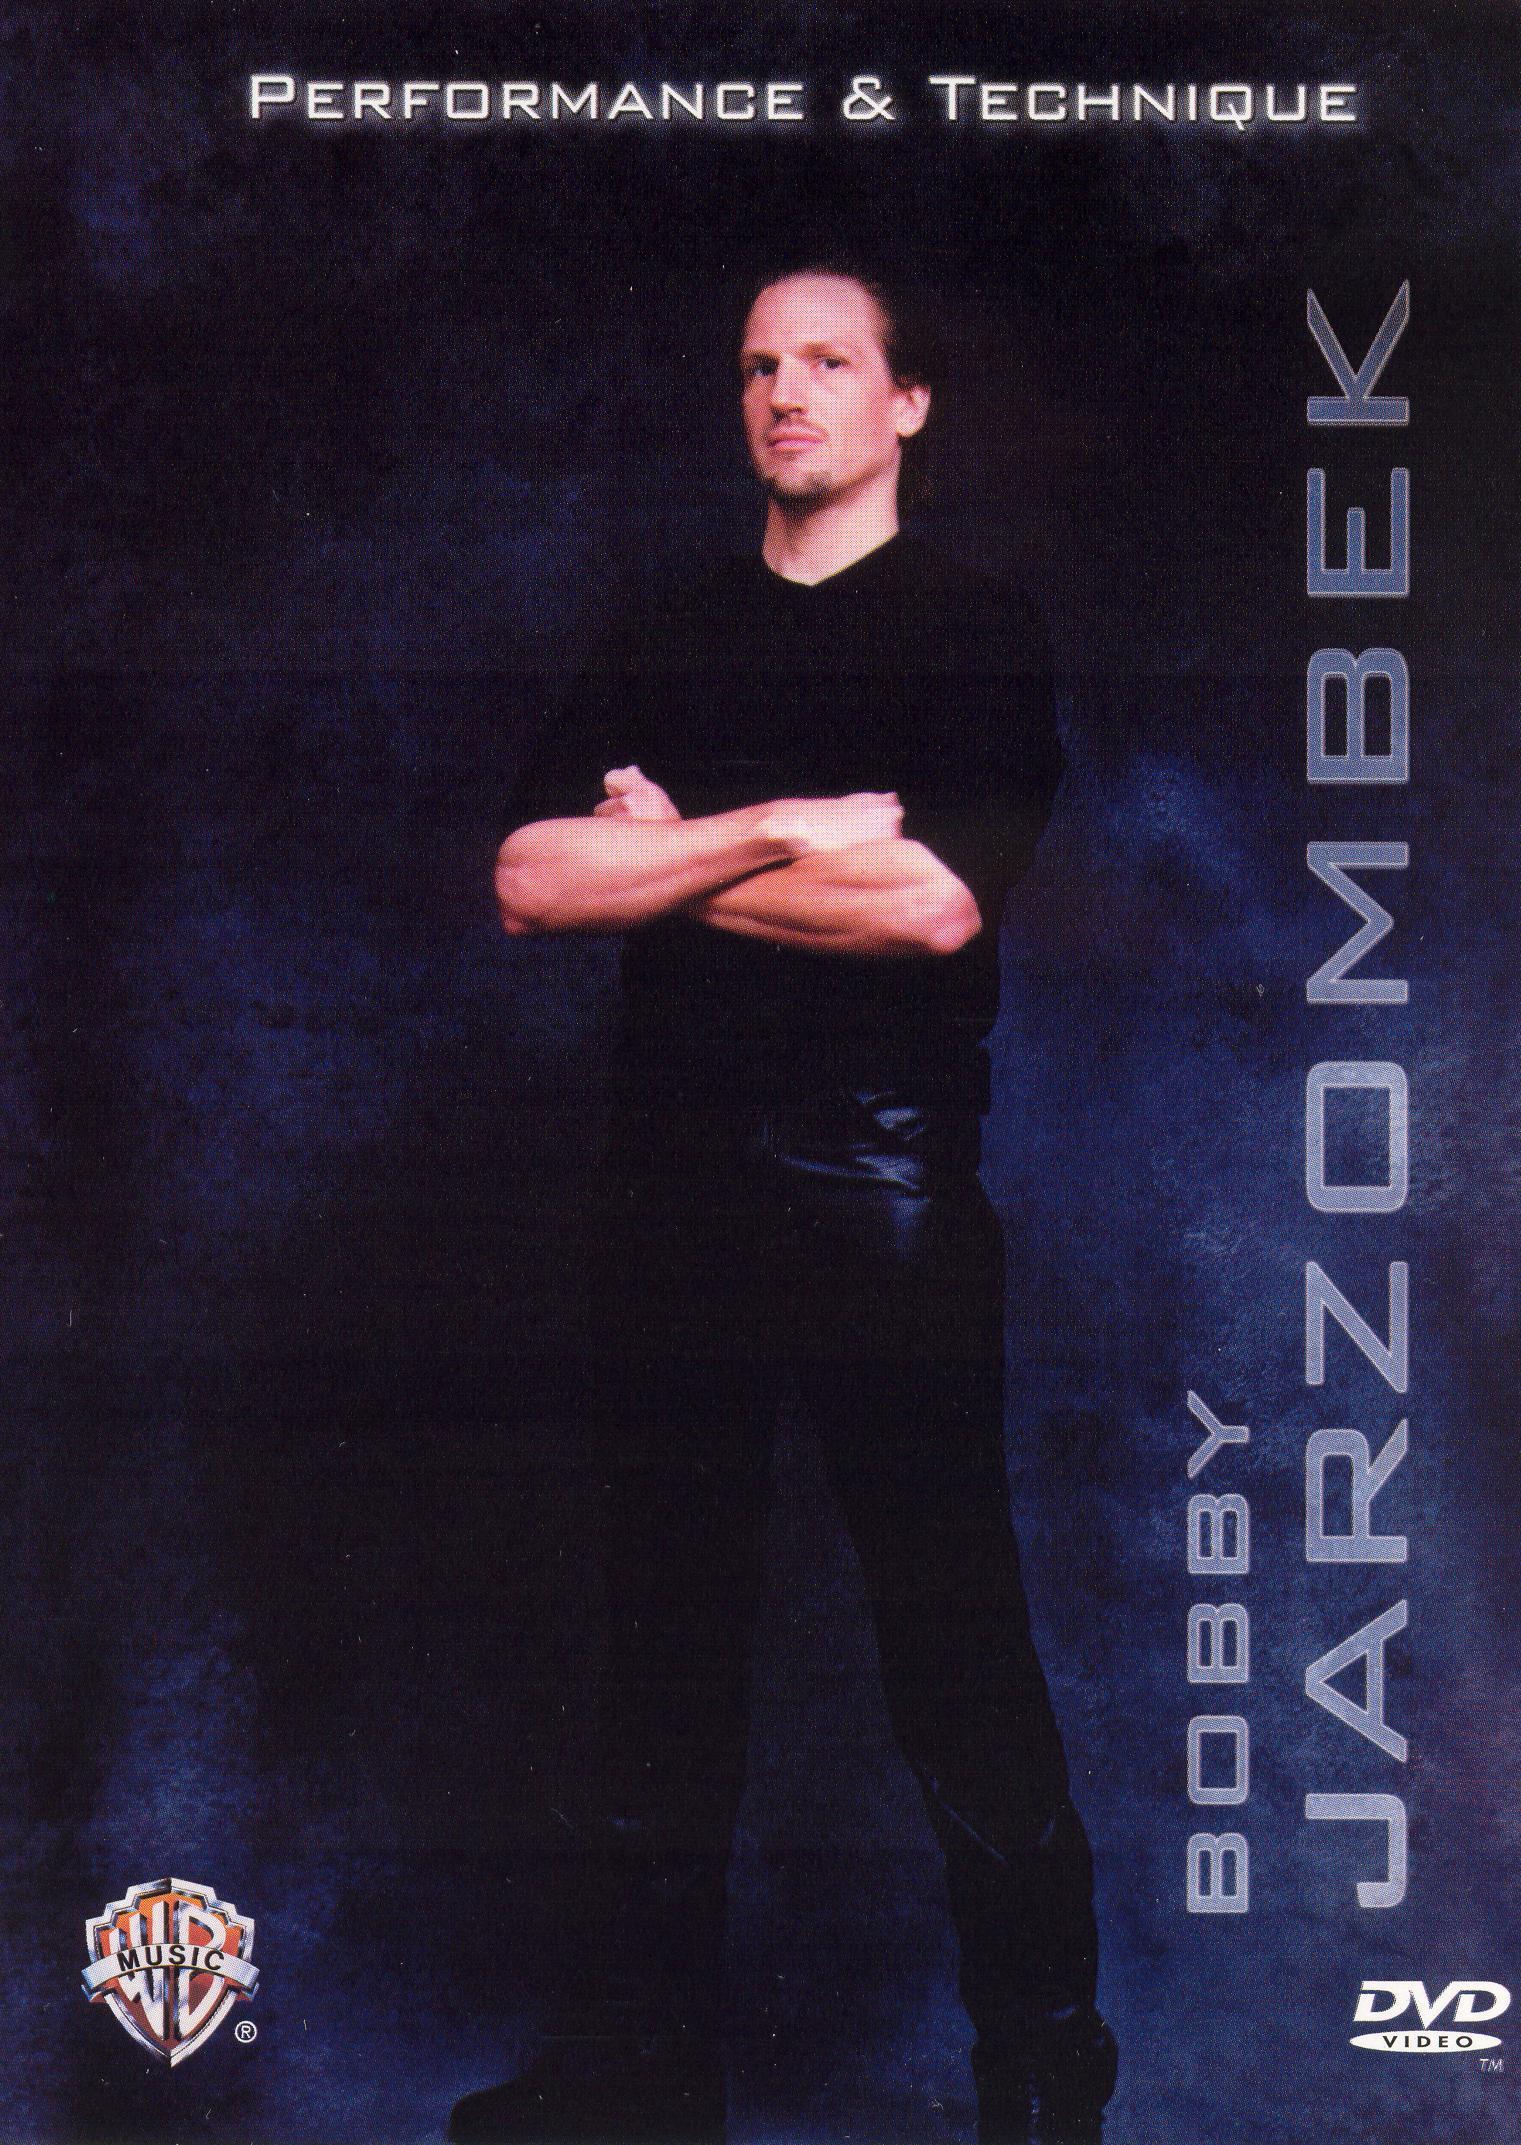 Bobby Jarzombek: Performance and Technique